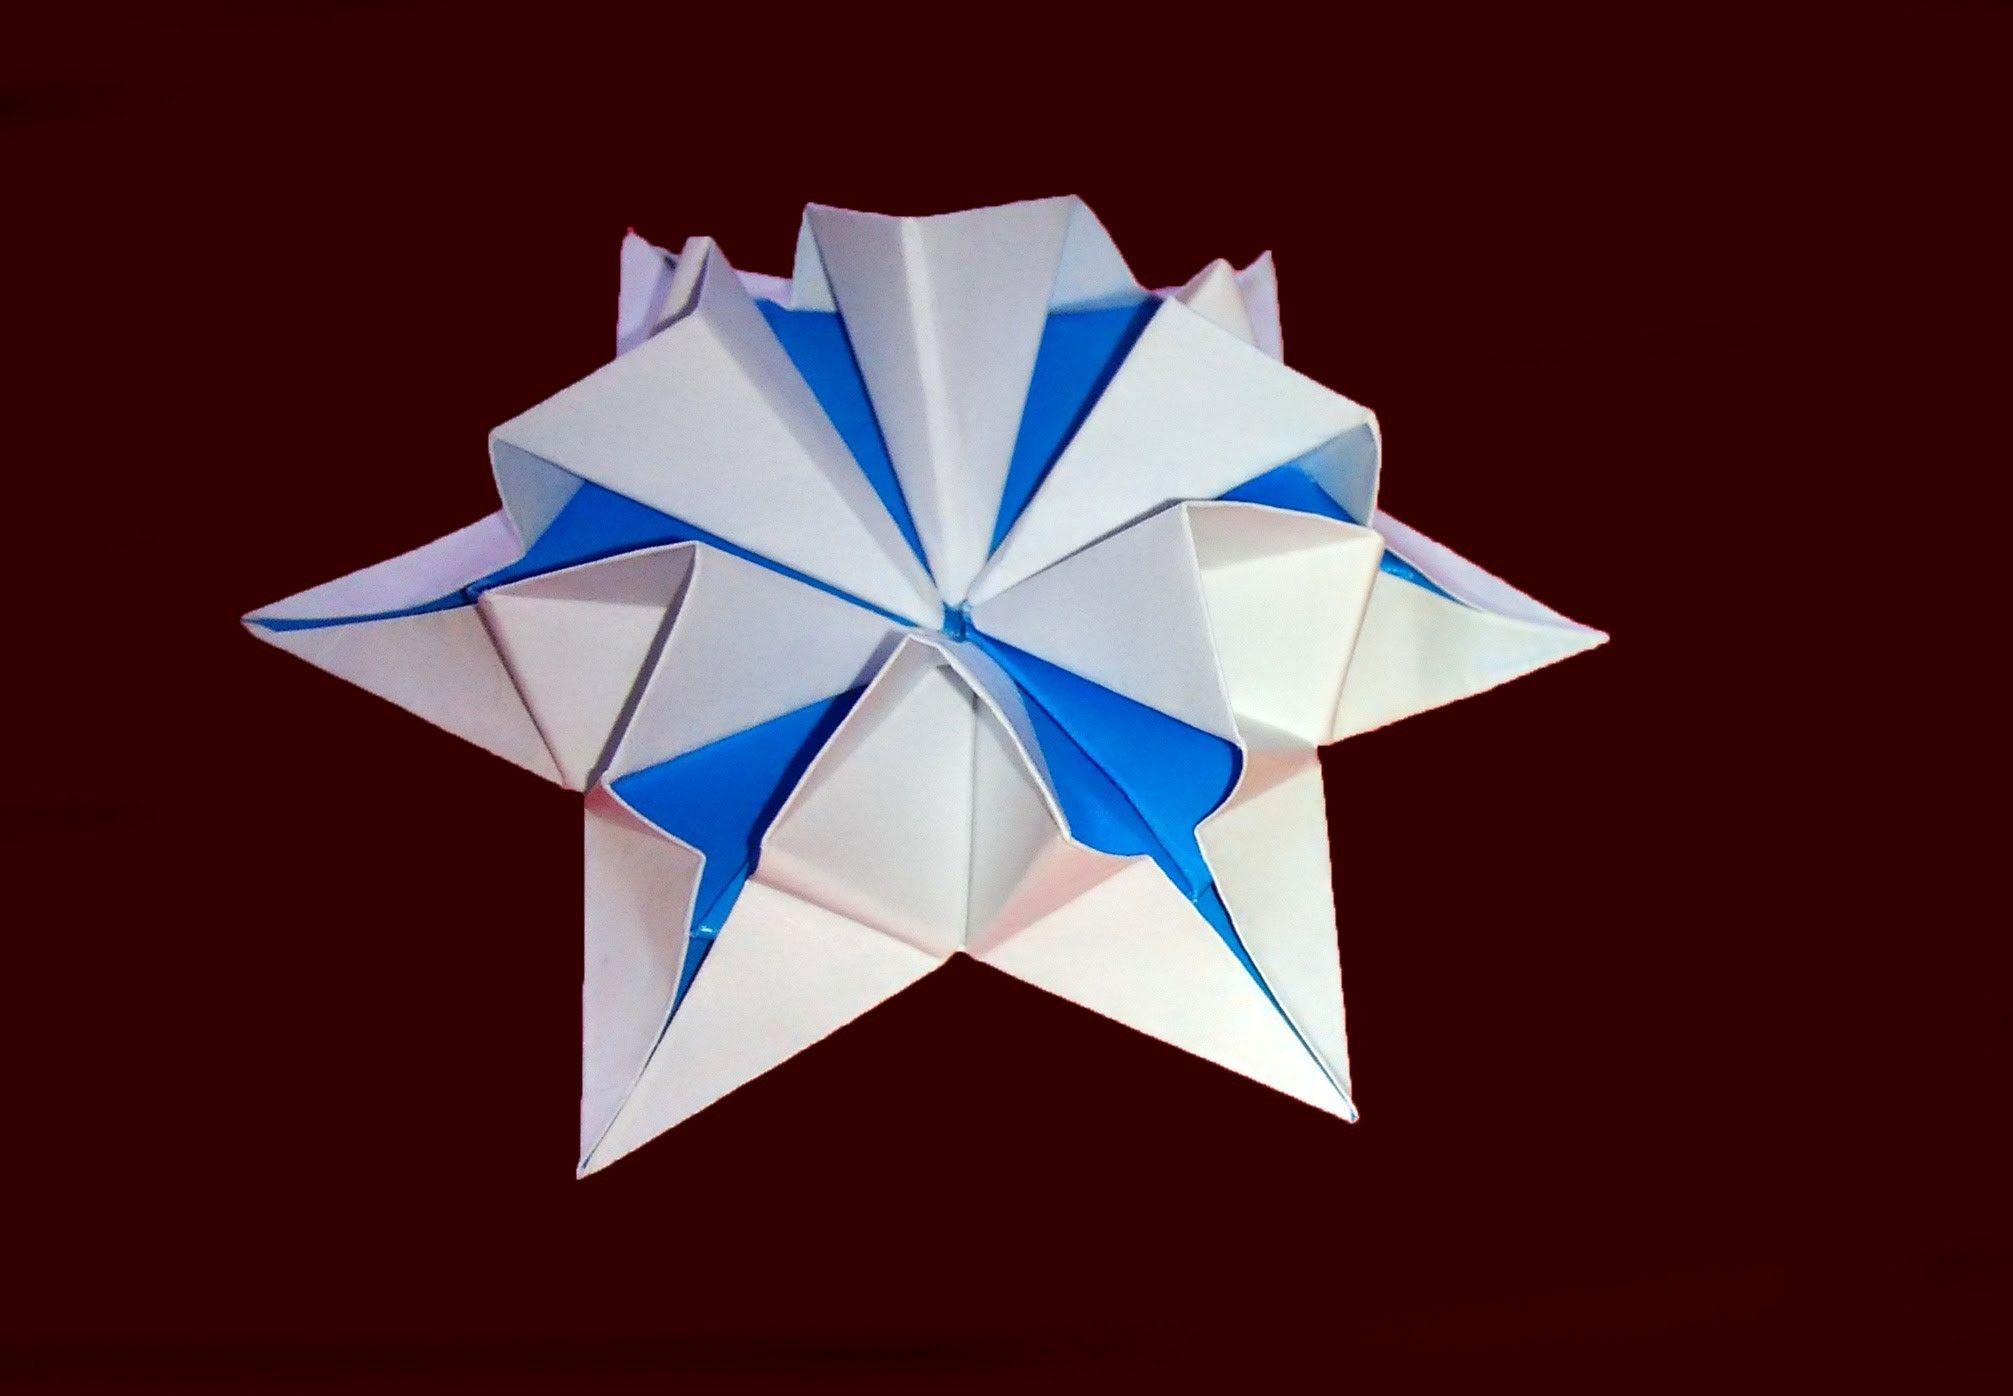 Amazing origami flower star 3d paper flower great ideas for amazing origami flower star 3d paper flower great ideas for christmas decor mightylinksfo